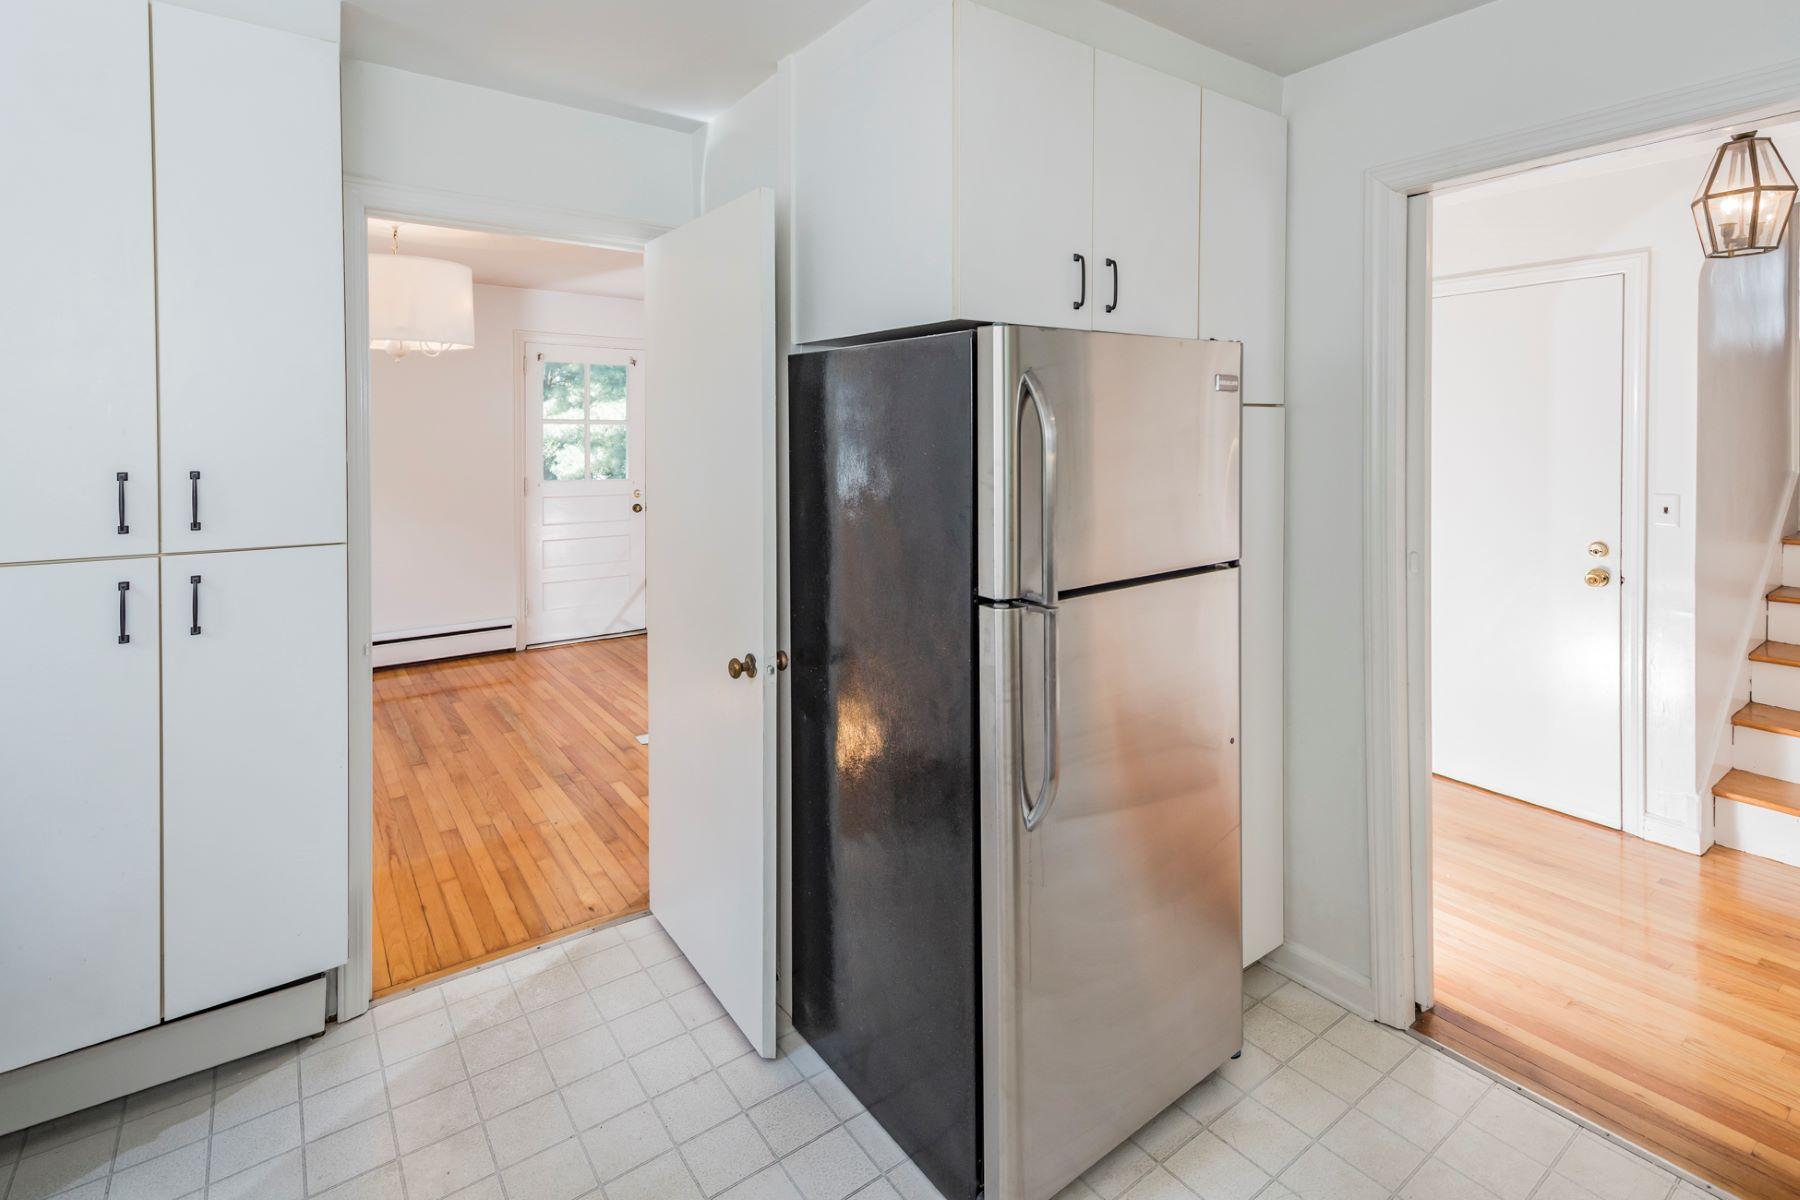 Additional photo for property listing at Wonderful Riverside Rental 49 Wilton Street, Princeton, New Jersey 08540 United States